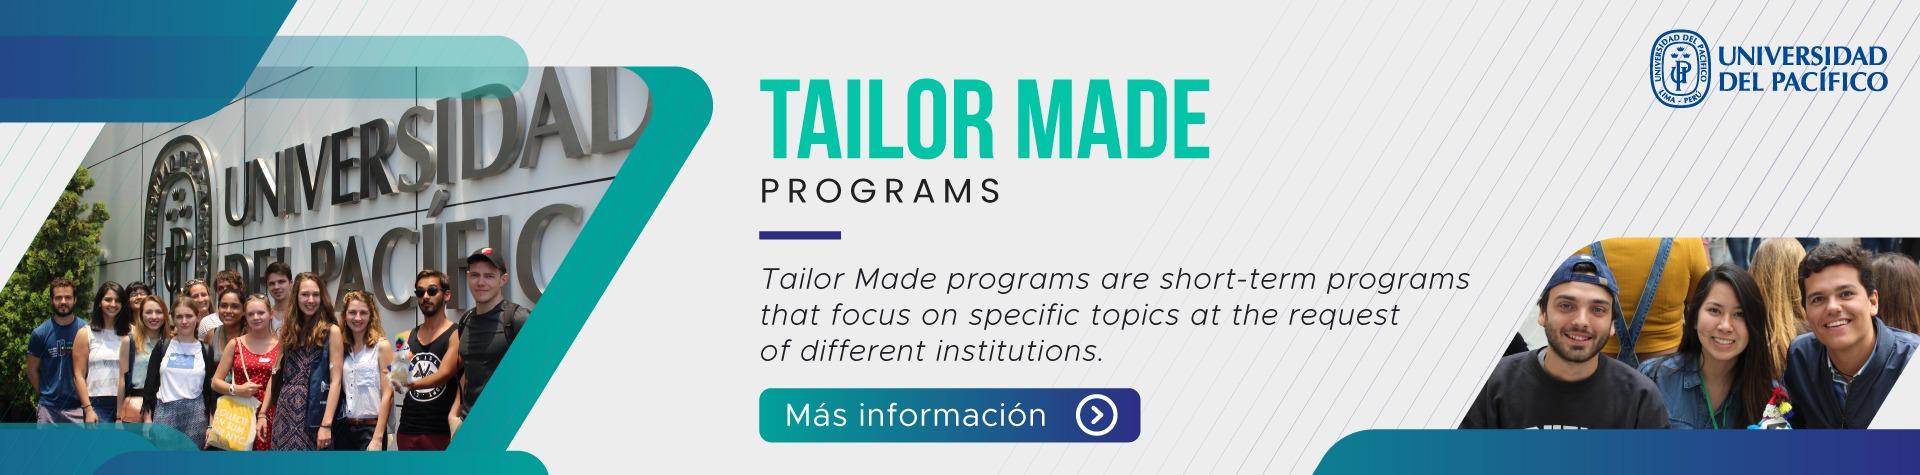 banner-principal_web-tailor